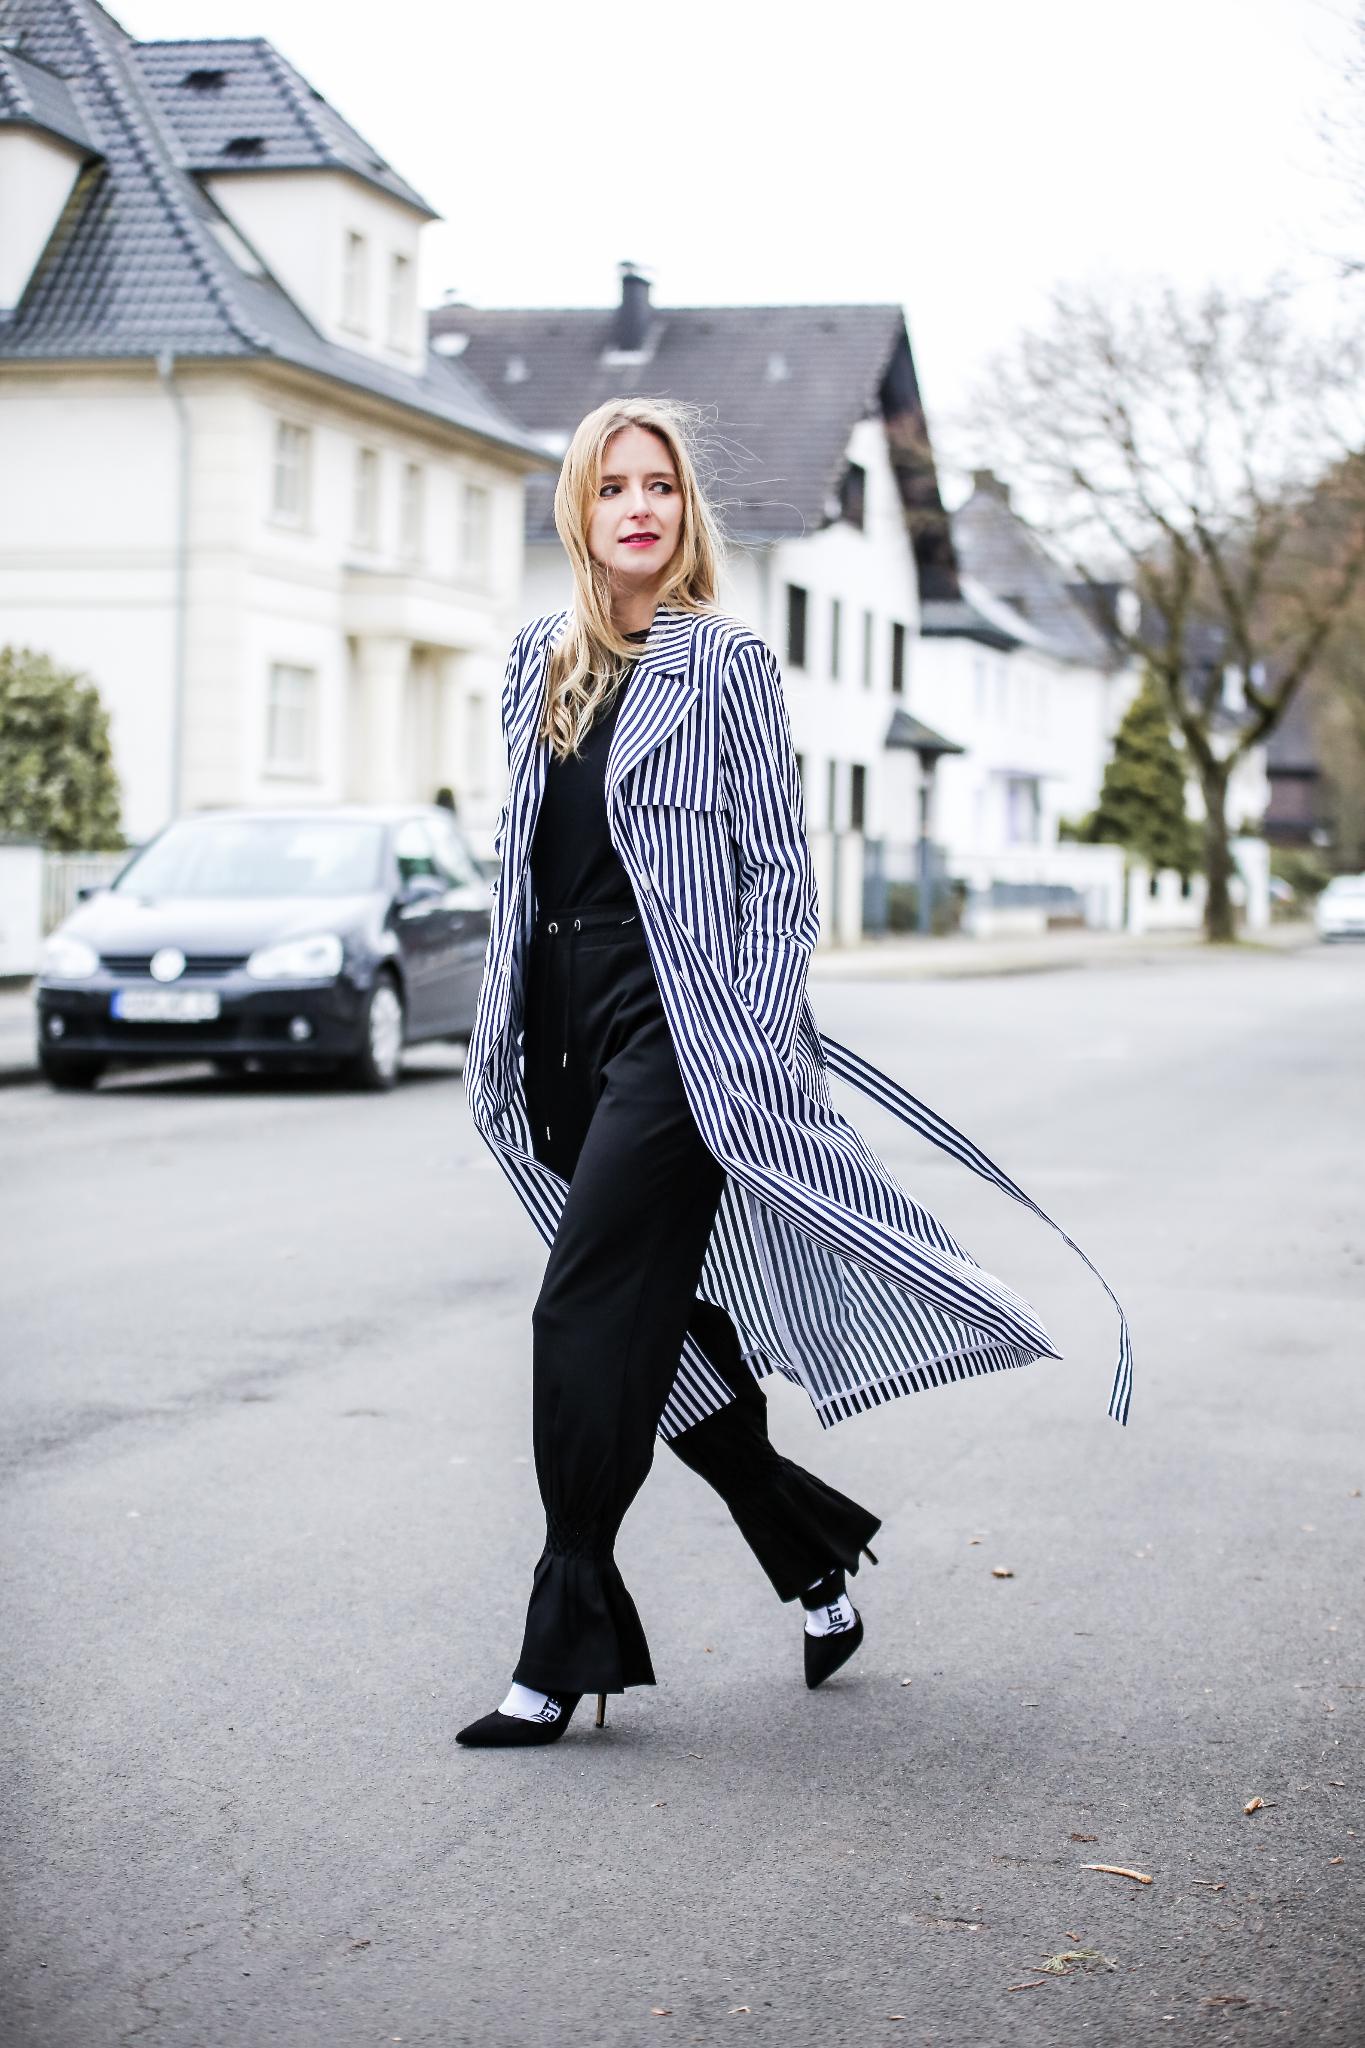 MOD-by-Monique-Fashion-Looks-Striped-Coat-Big-Volants